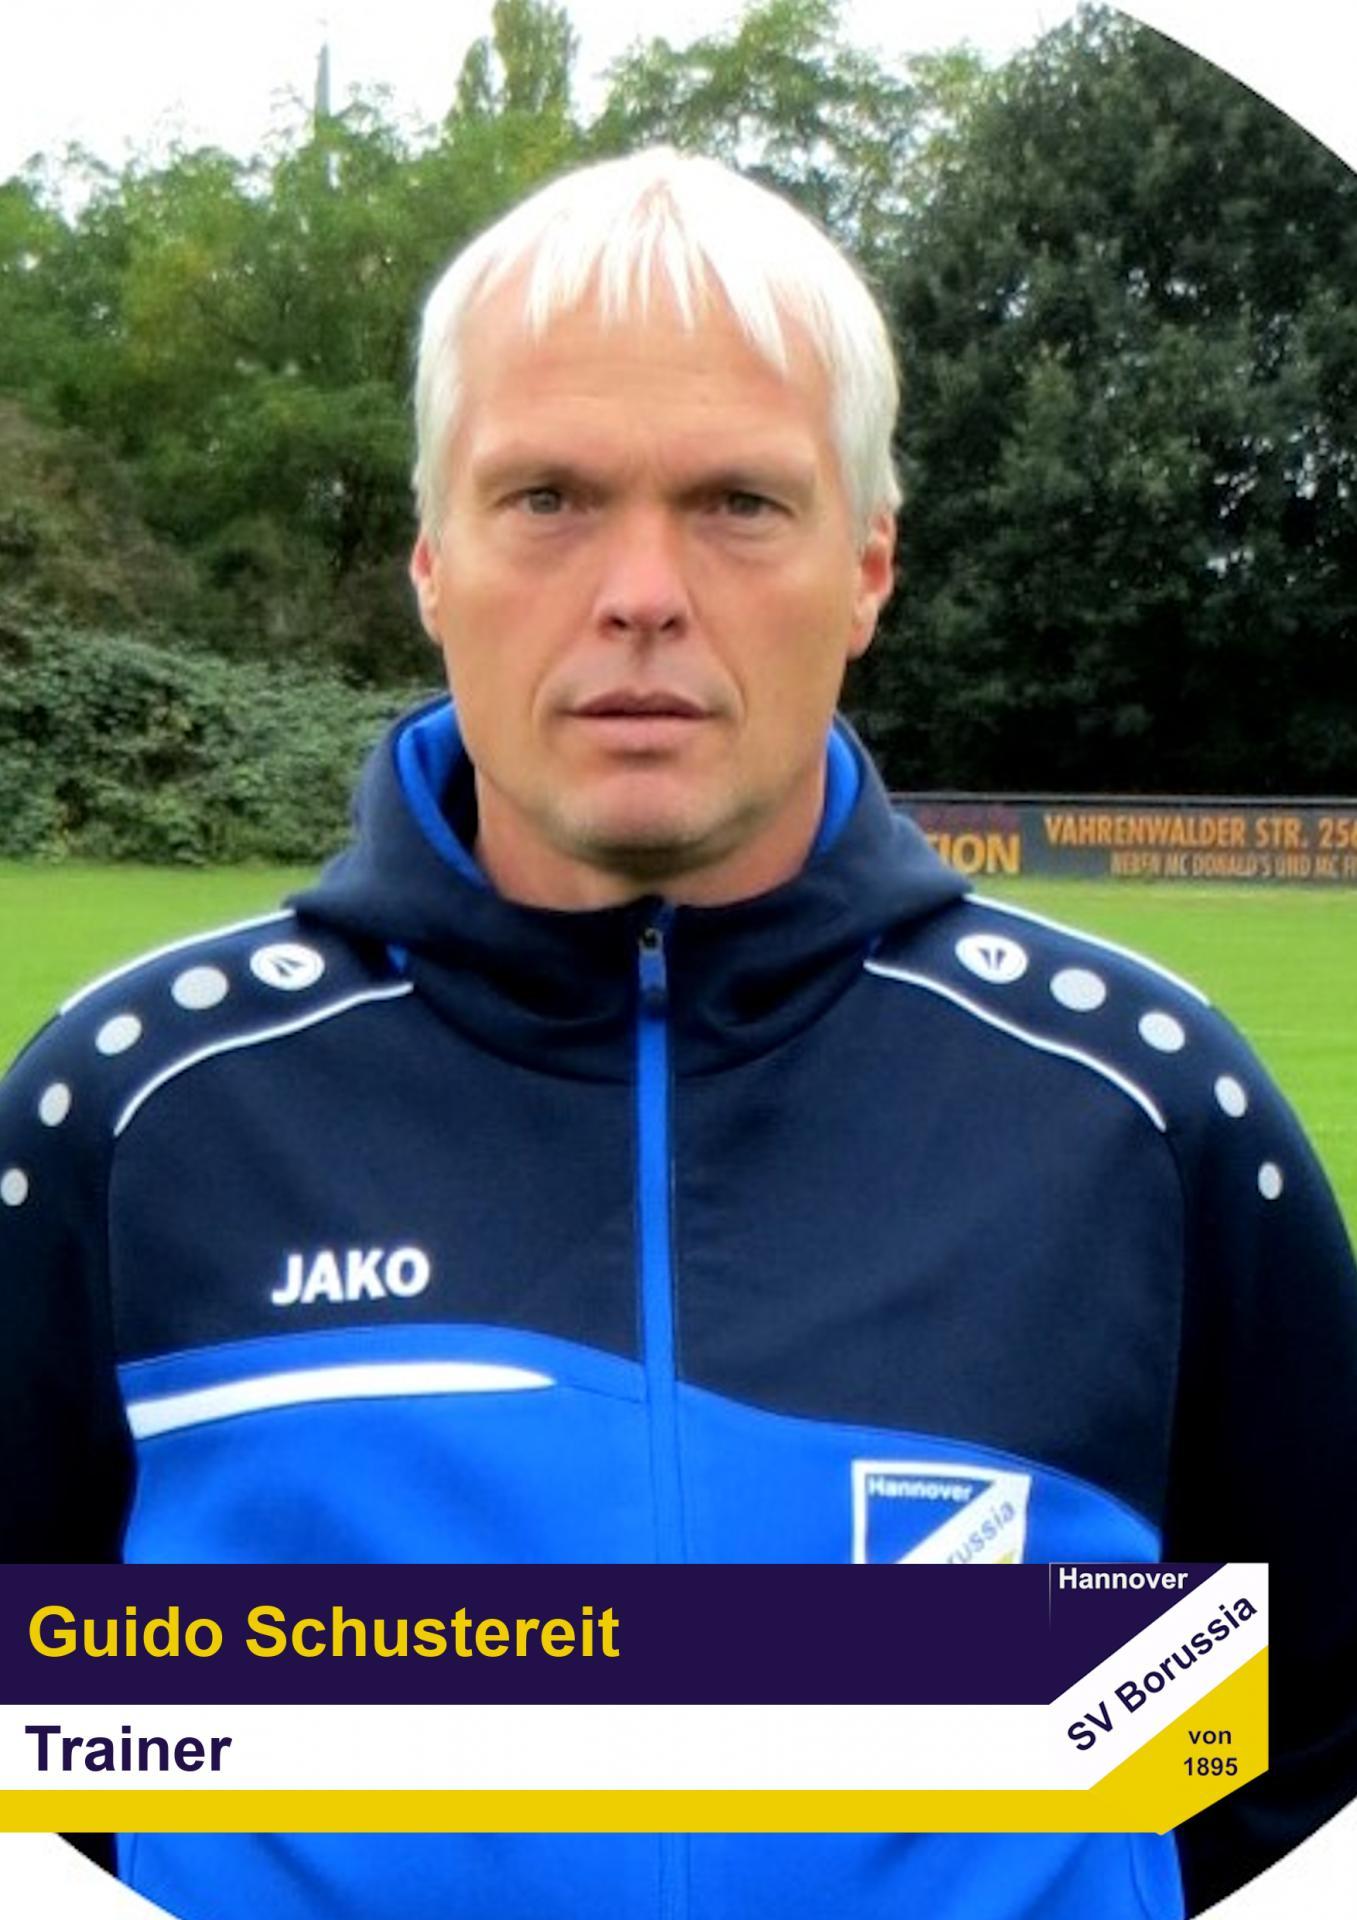 Guido Schustereit